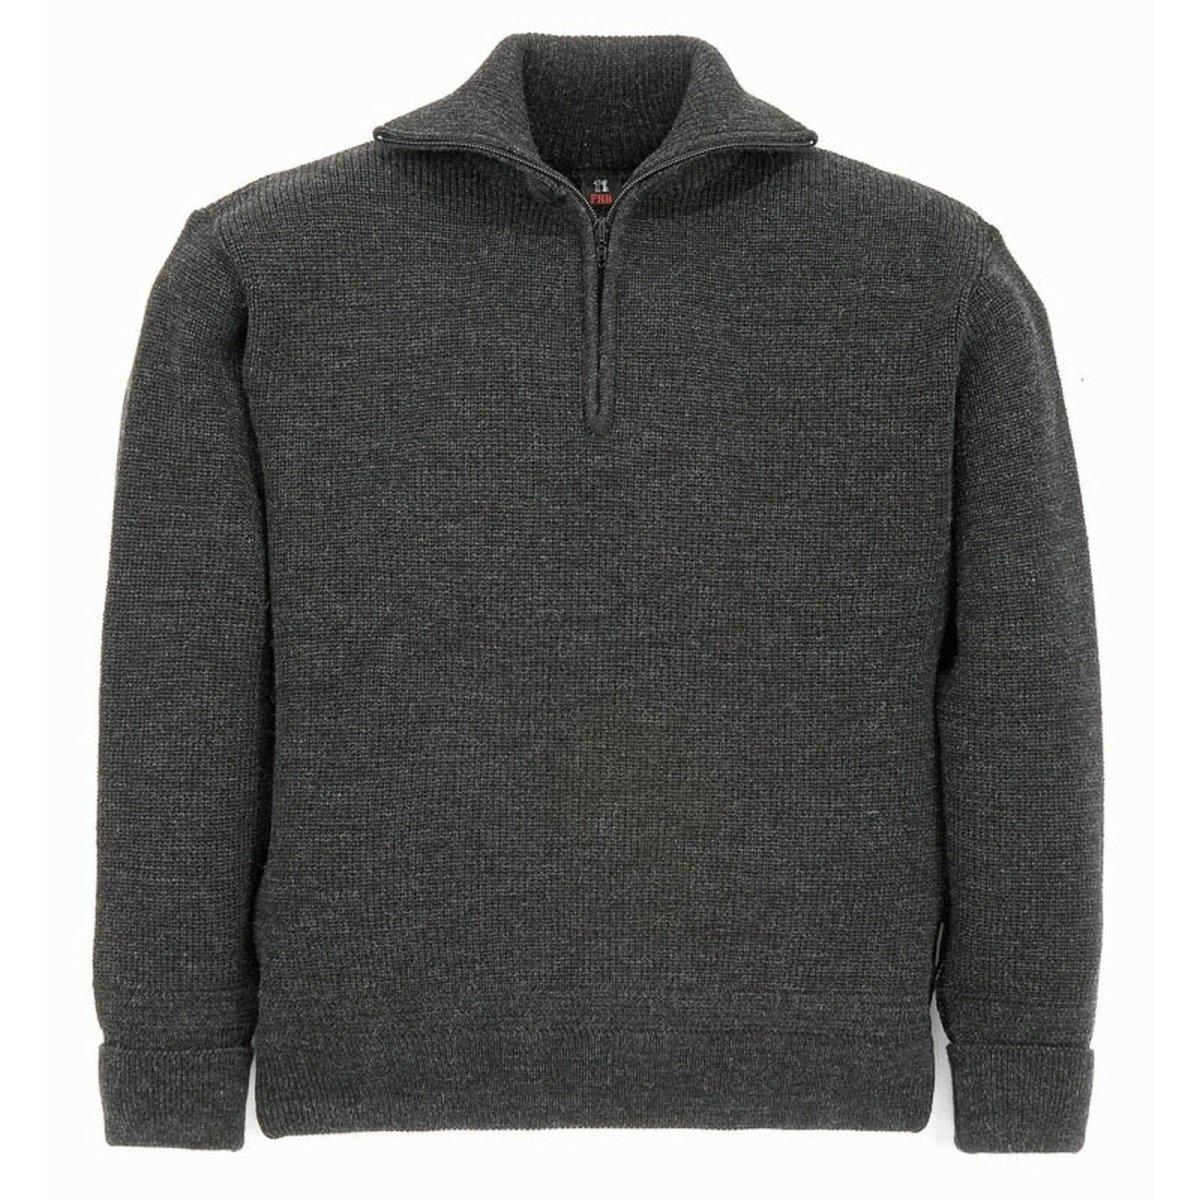 FHB Seemanns Pullover  34145 HINNERK  anthrazit Troyer Pullover Arbeitspullover XL